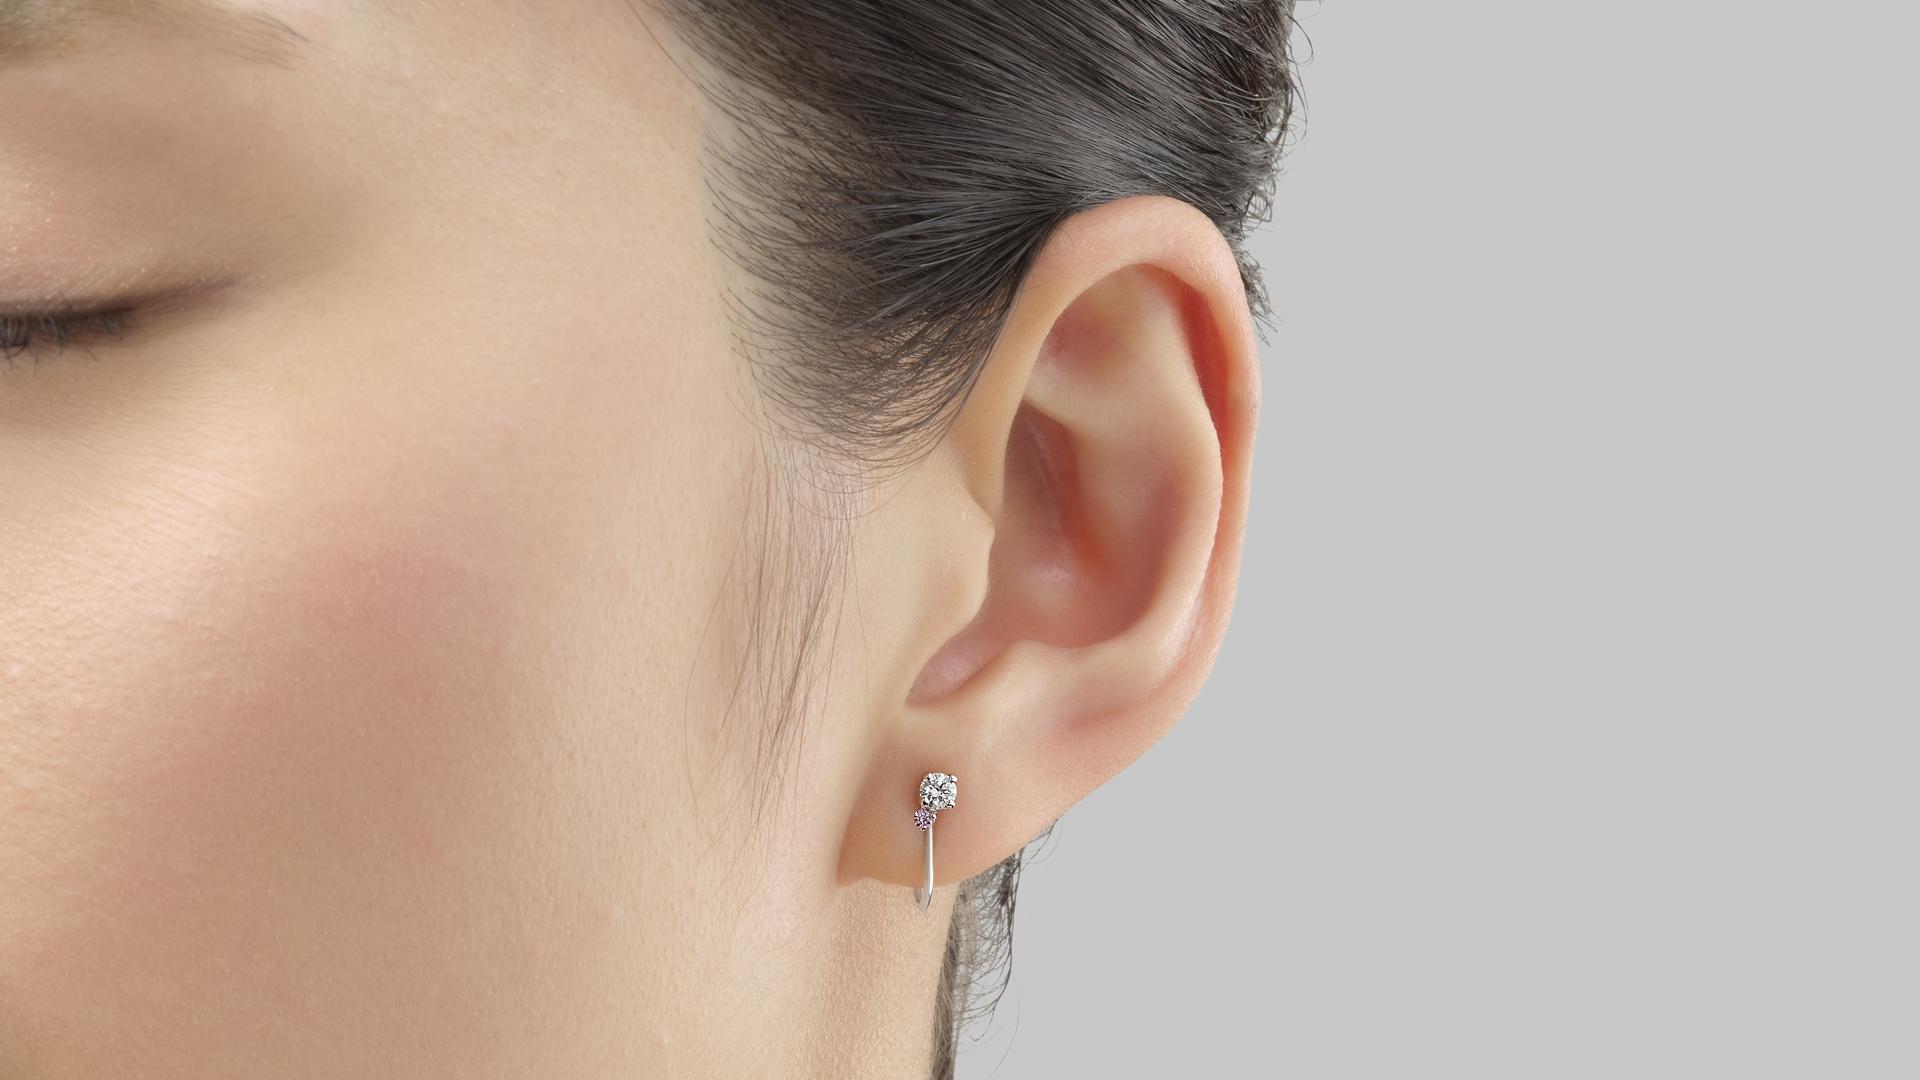 kiffa earring キファ イヤリング | 2